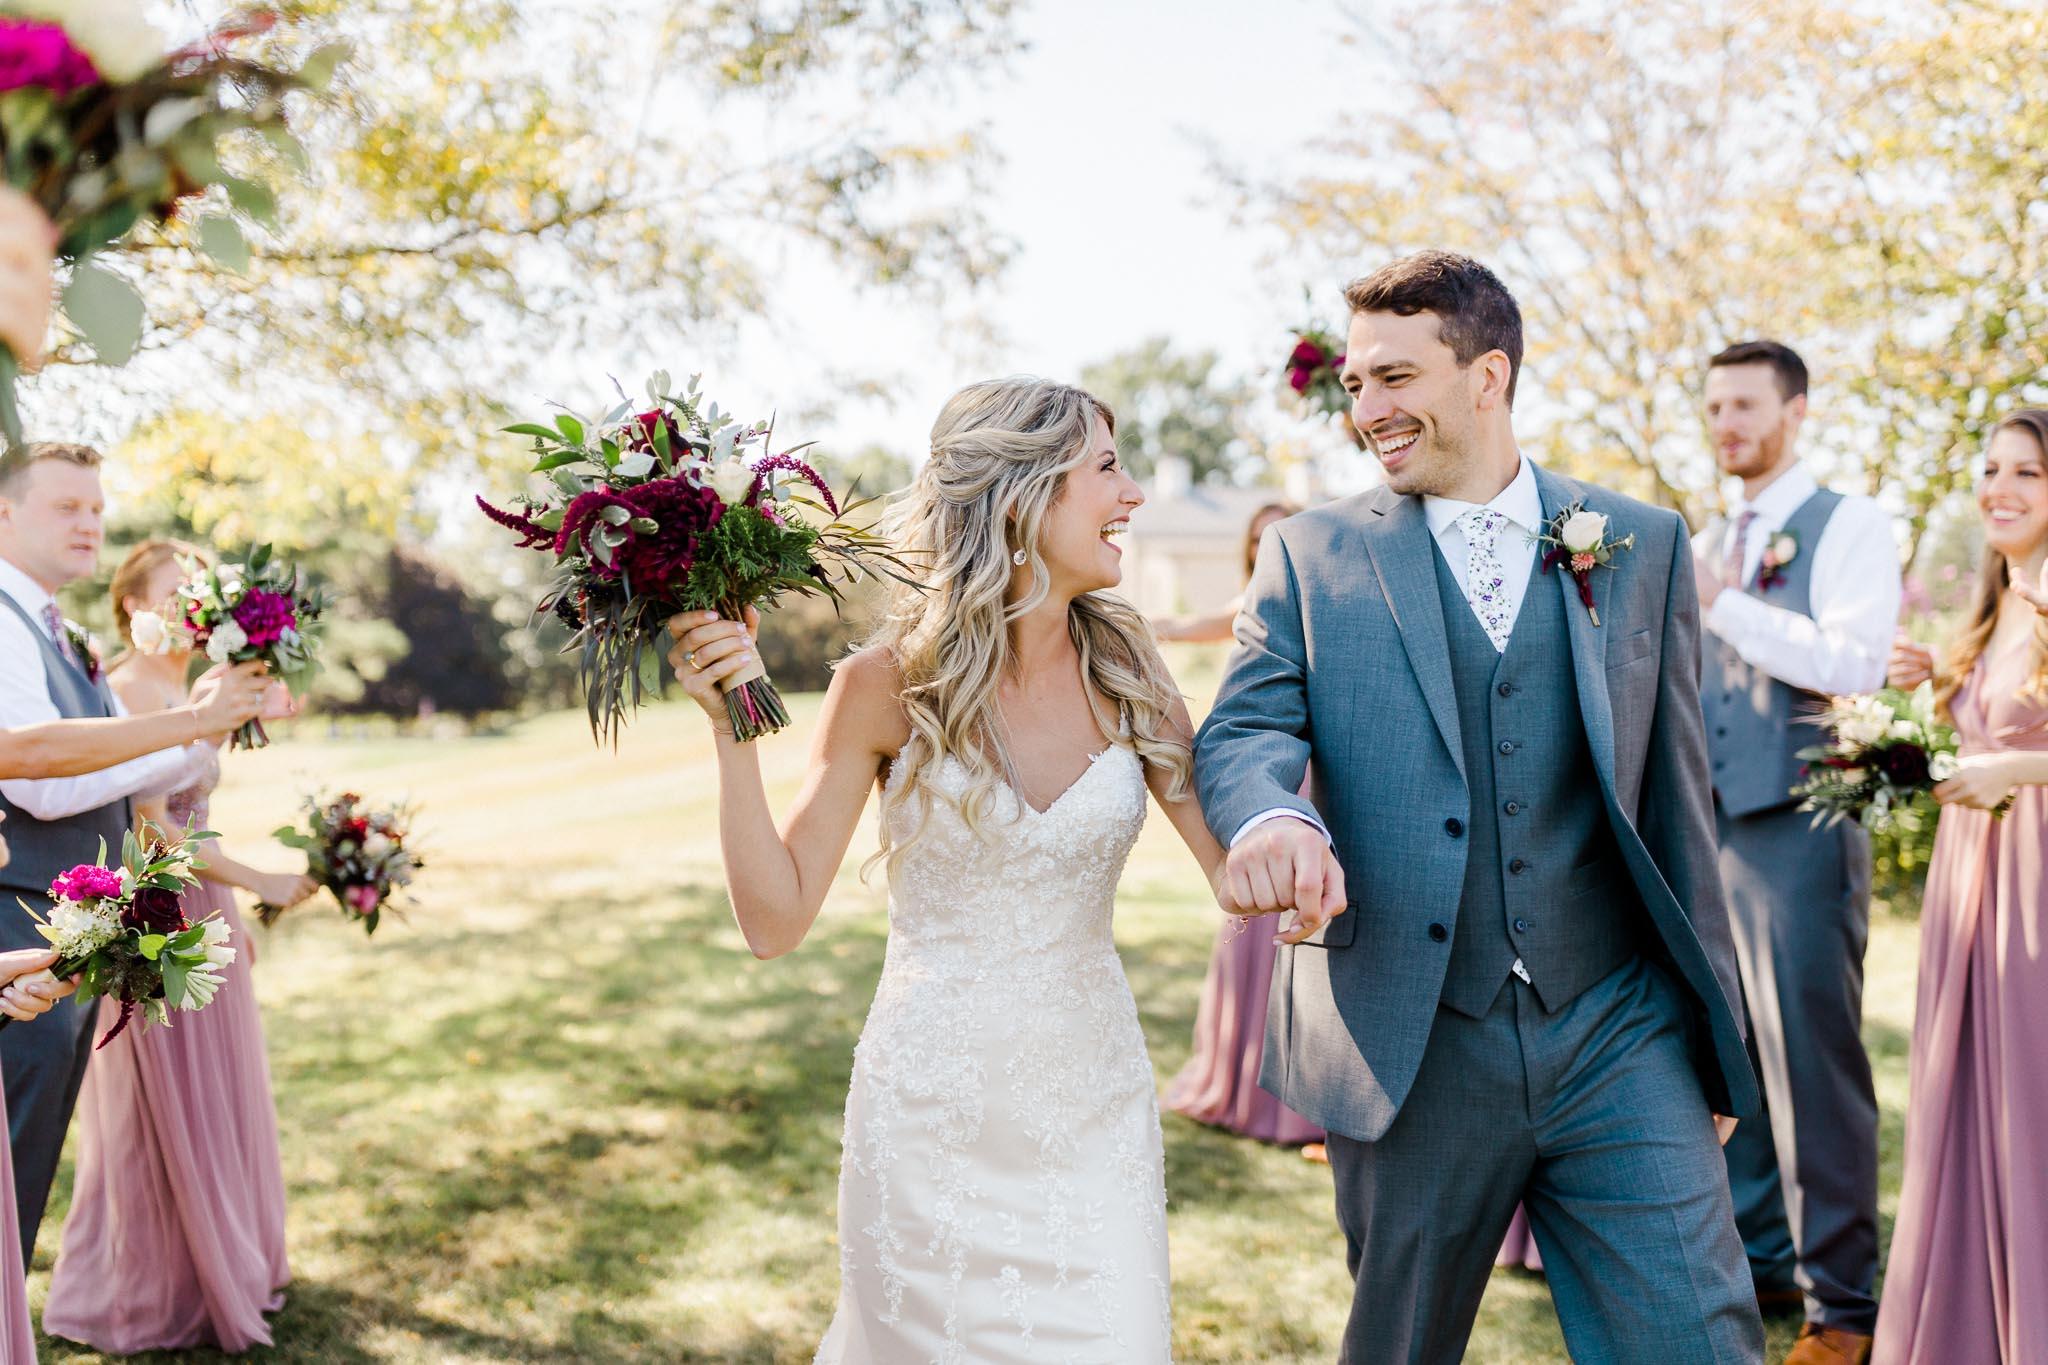 Frosty-Valley-September-Wedding-7488.jpg